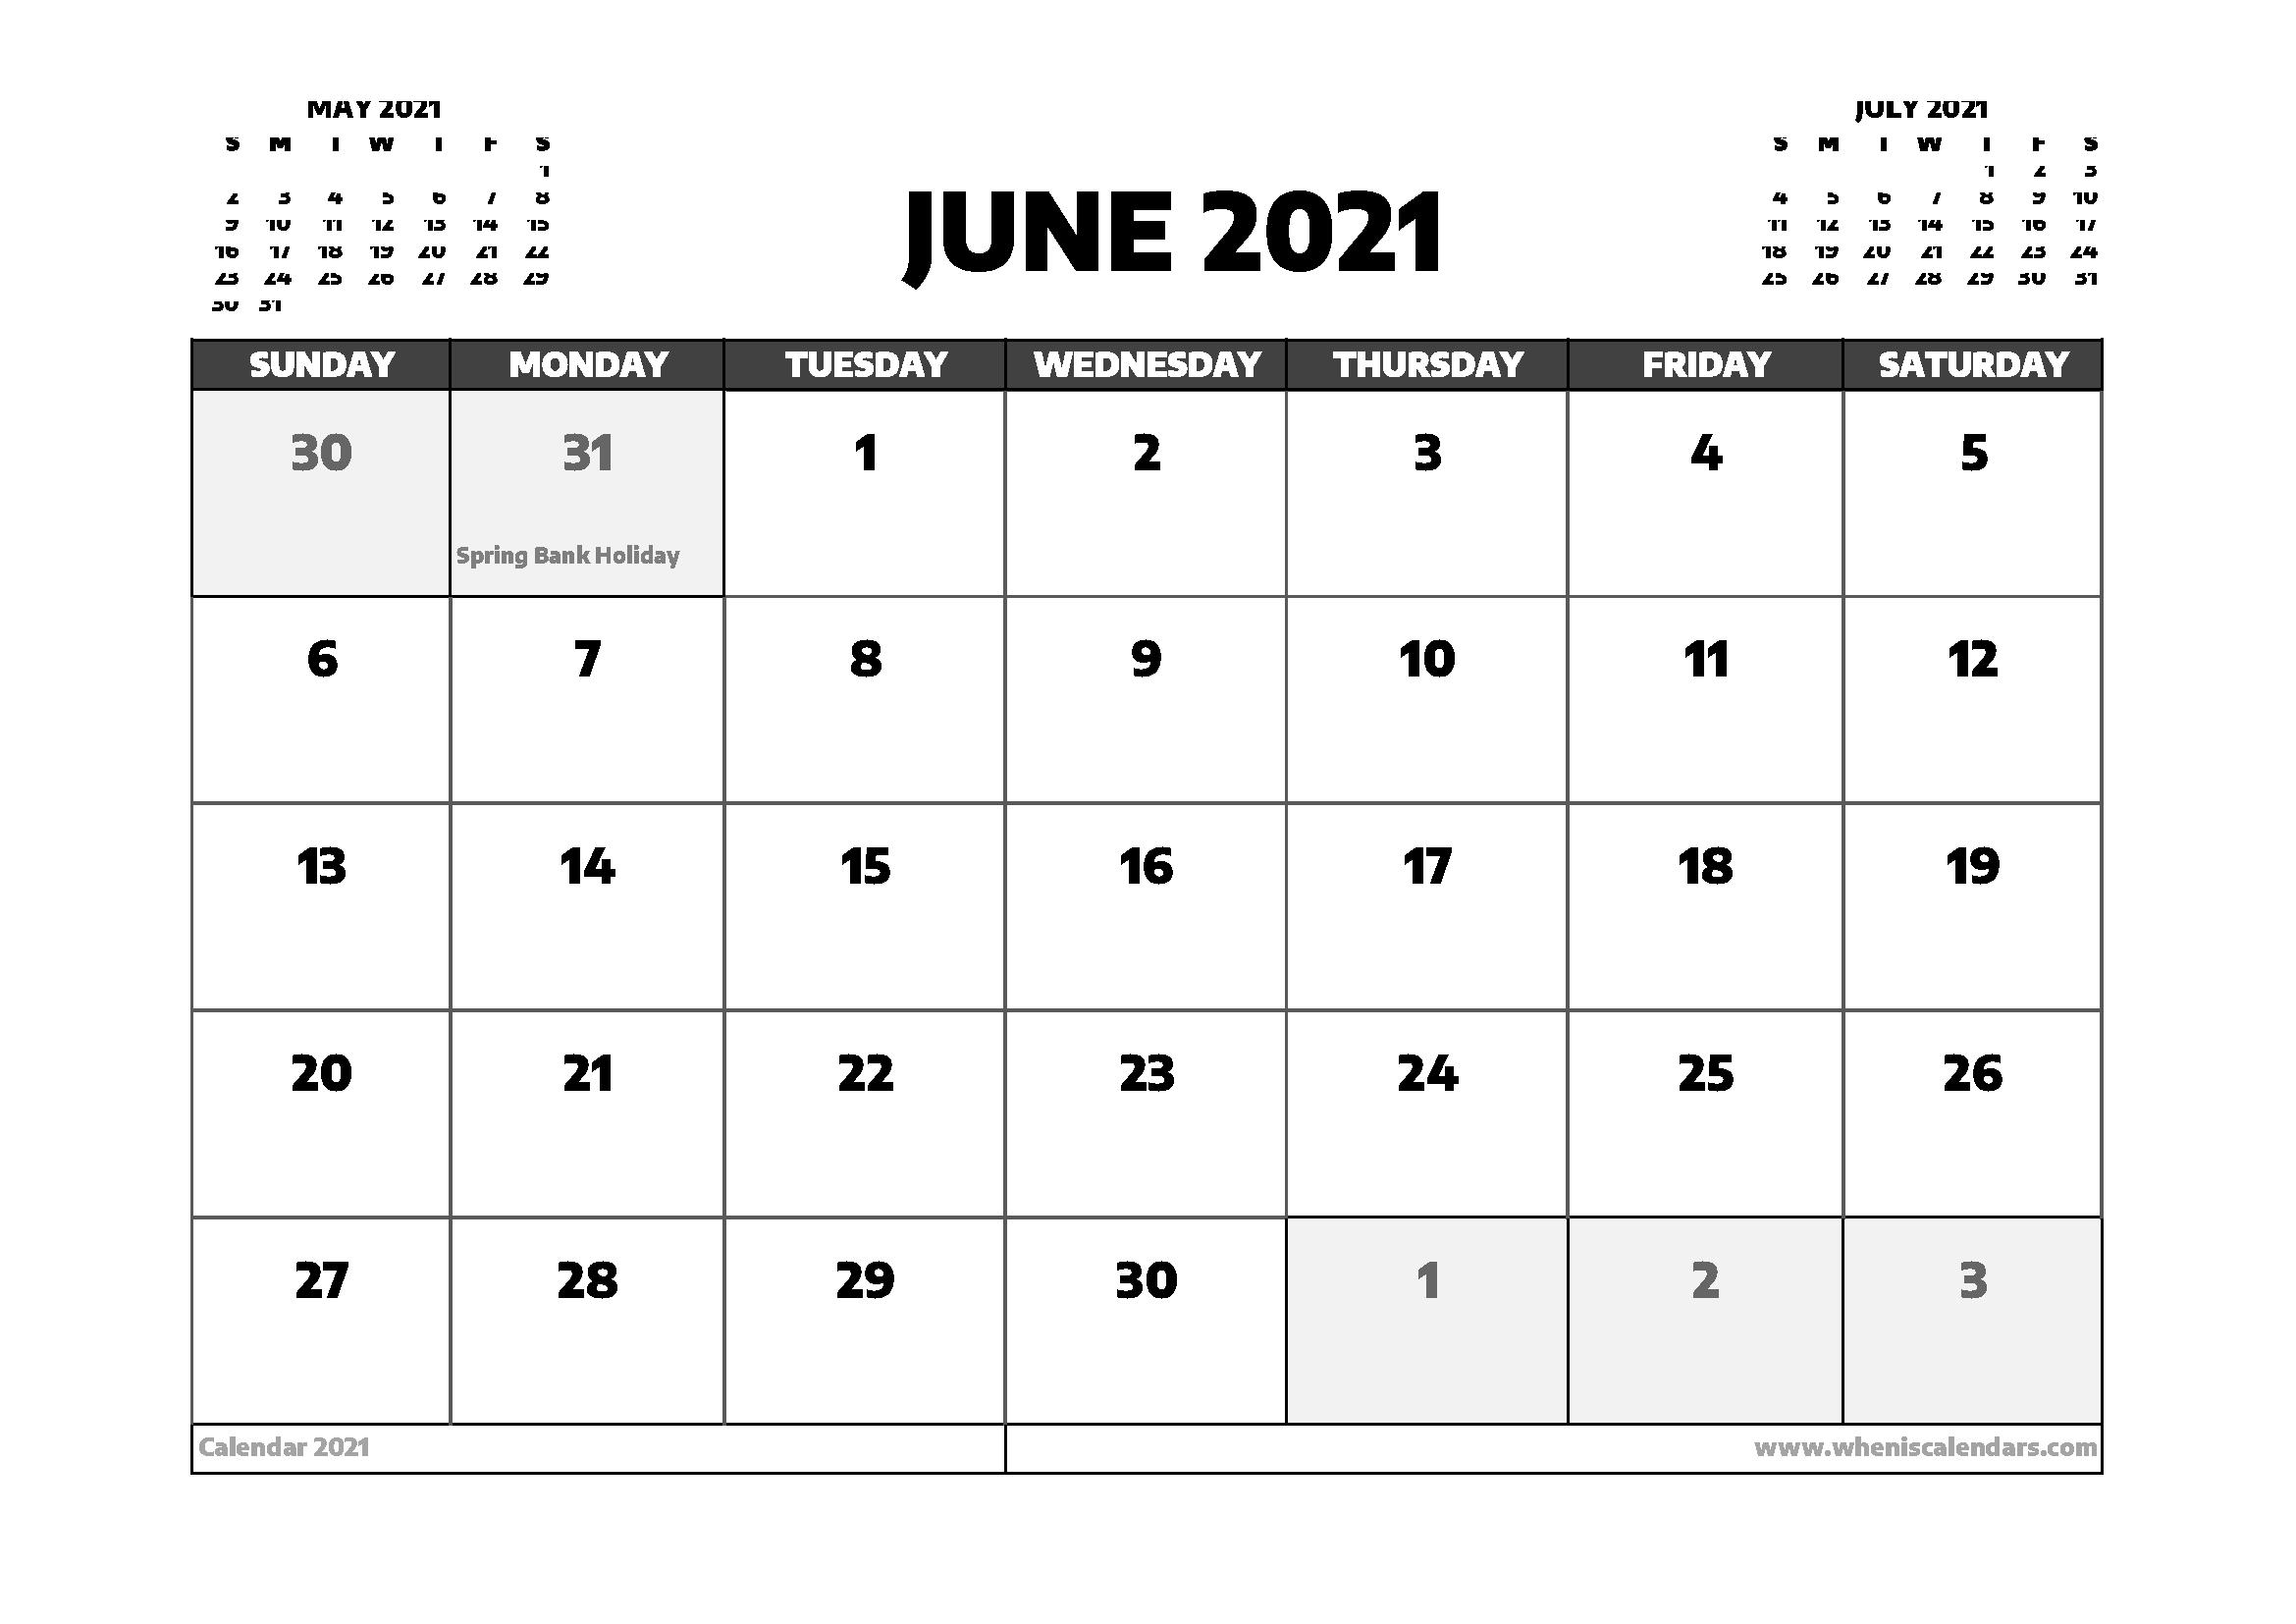 Universal Sept Calendar 2021 With Holidays 85' X11' | Get